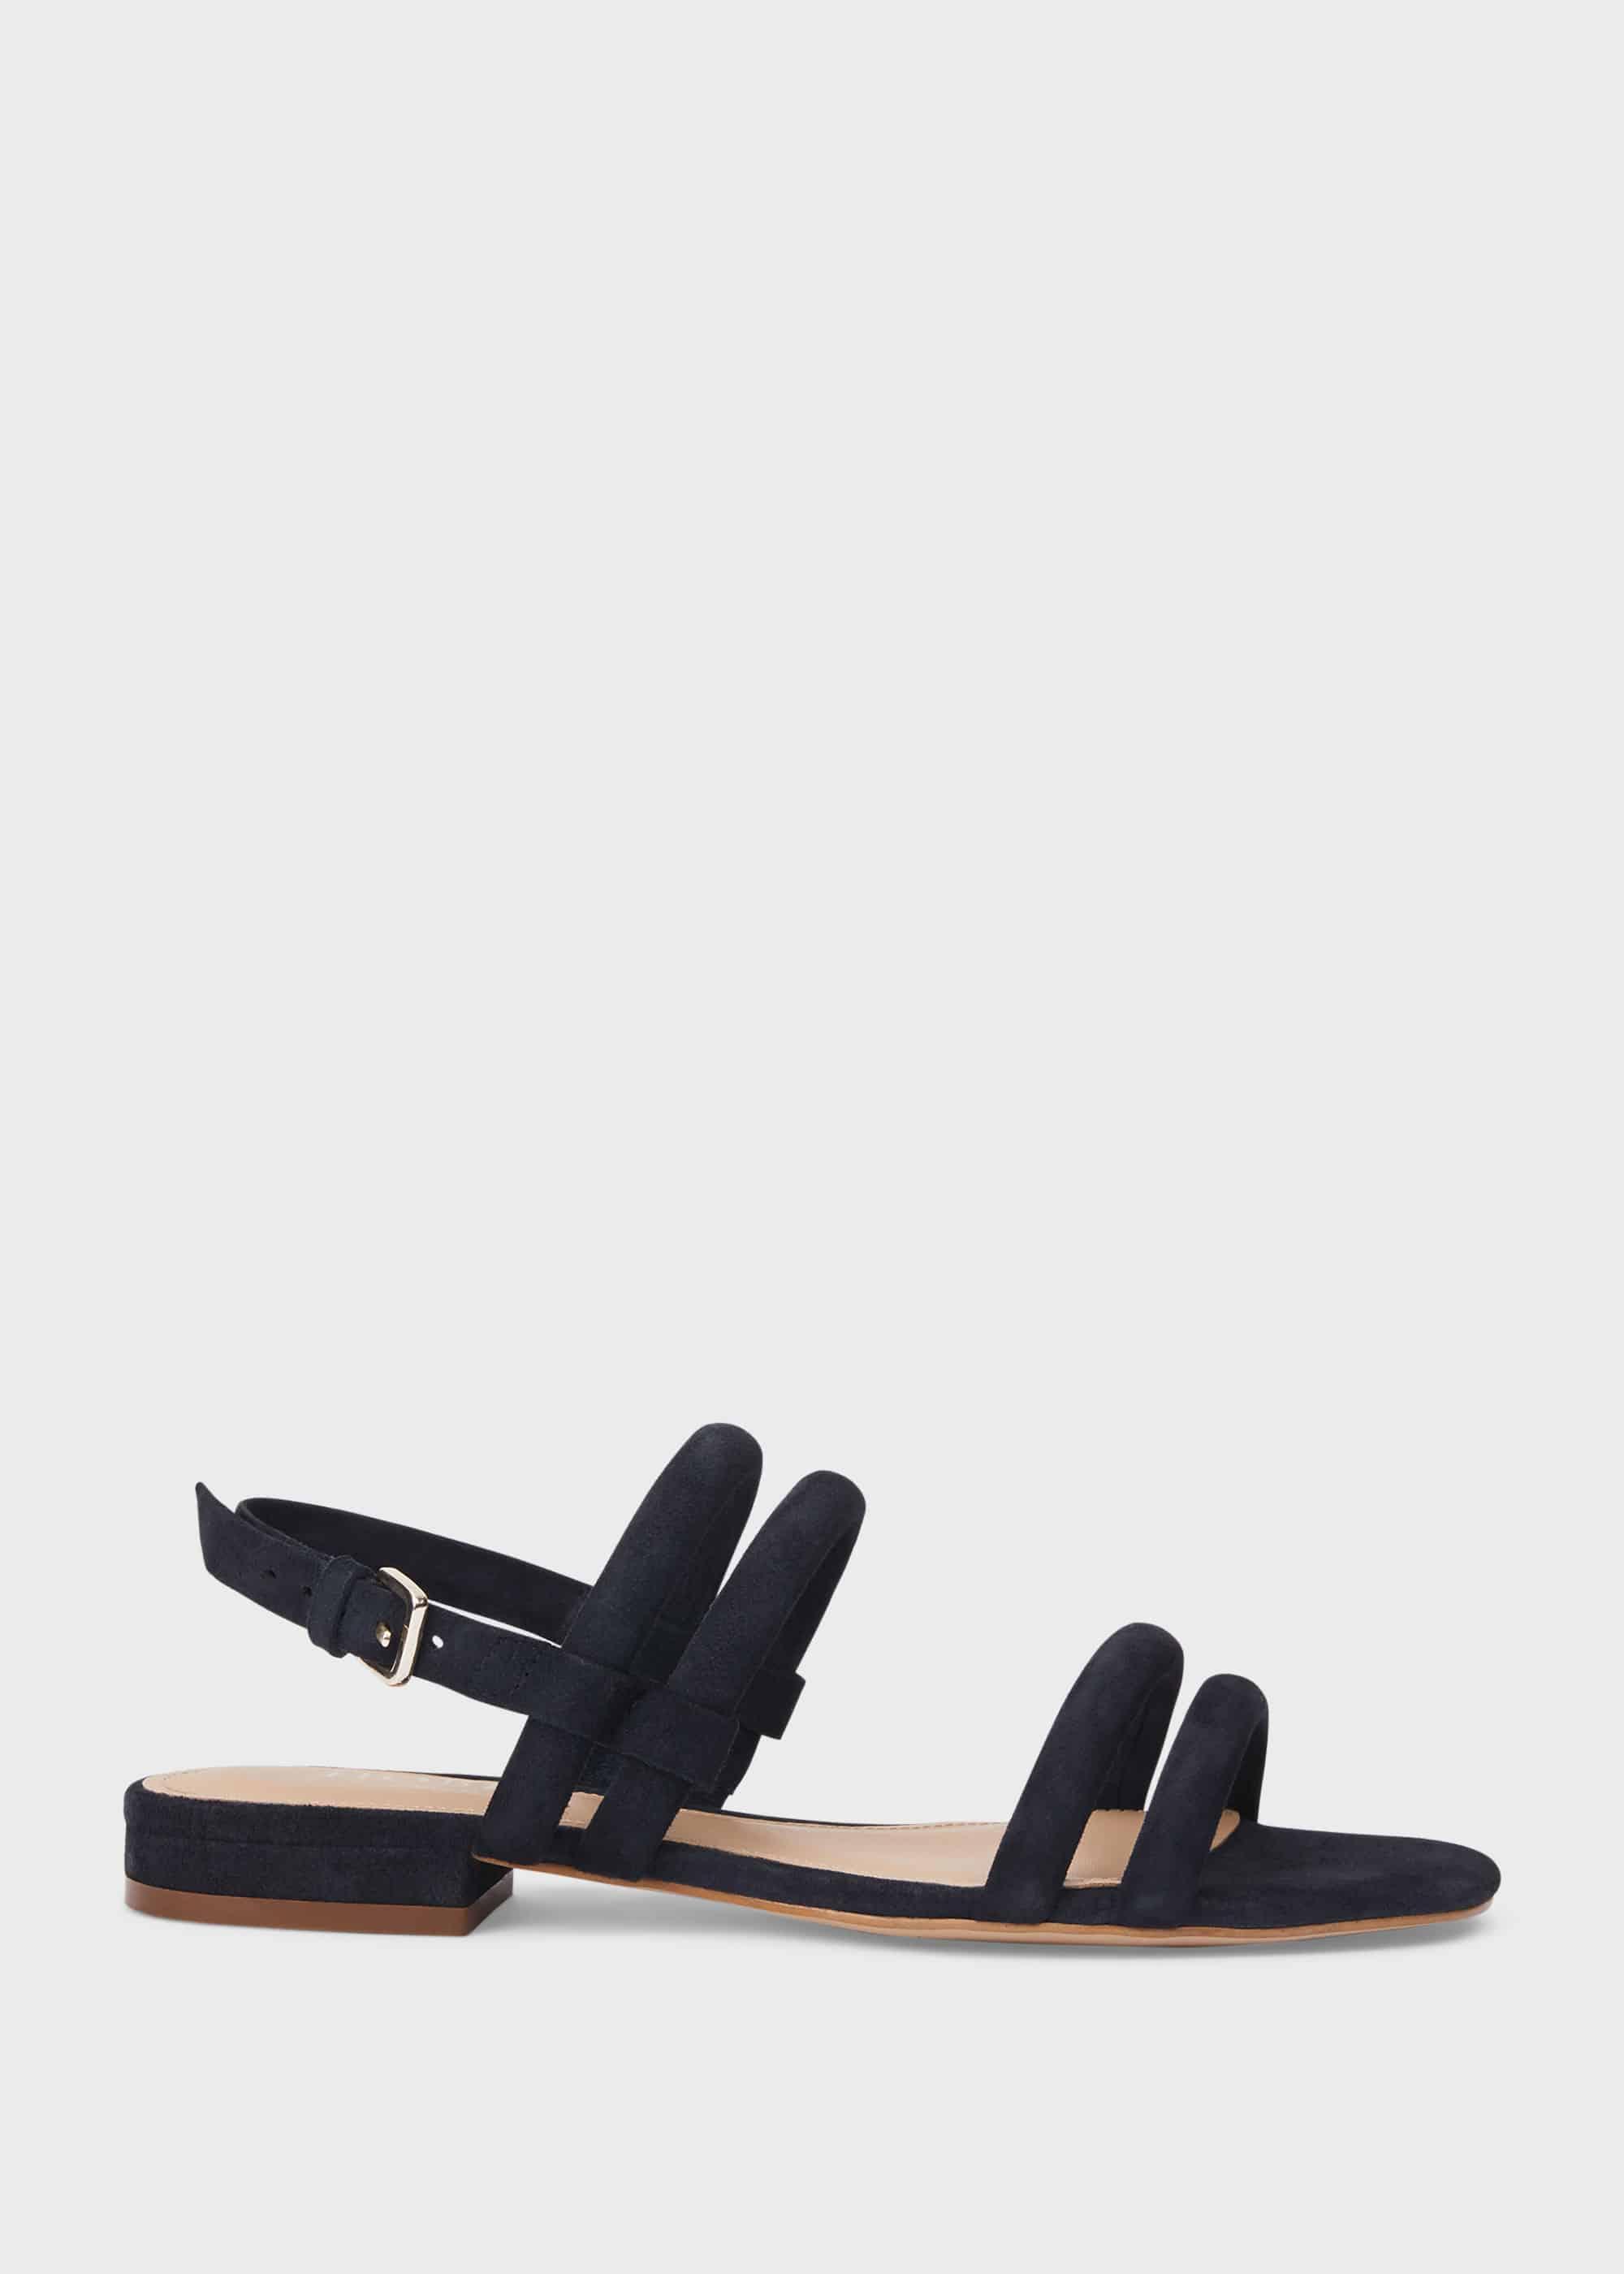 Hobbs Women Orla Suede Sandals